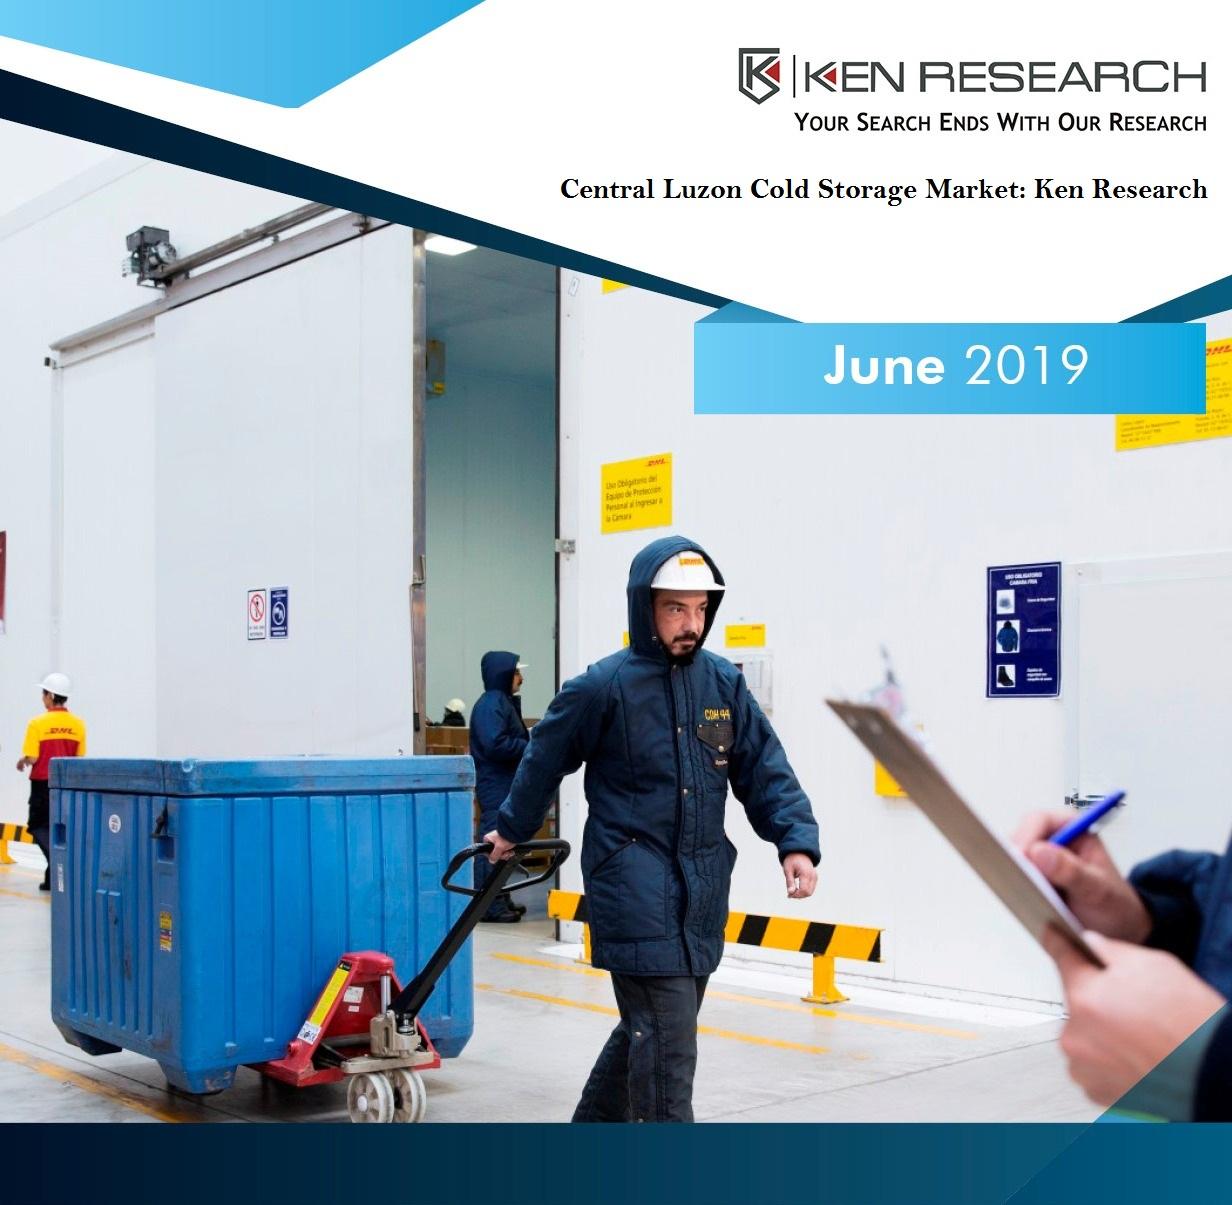 Industrial RFID for Cold Storage Logistics Archives - Ken